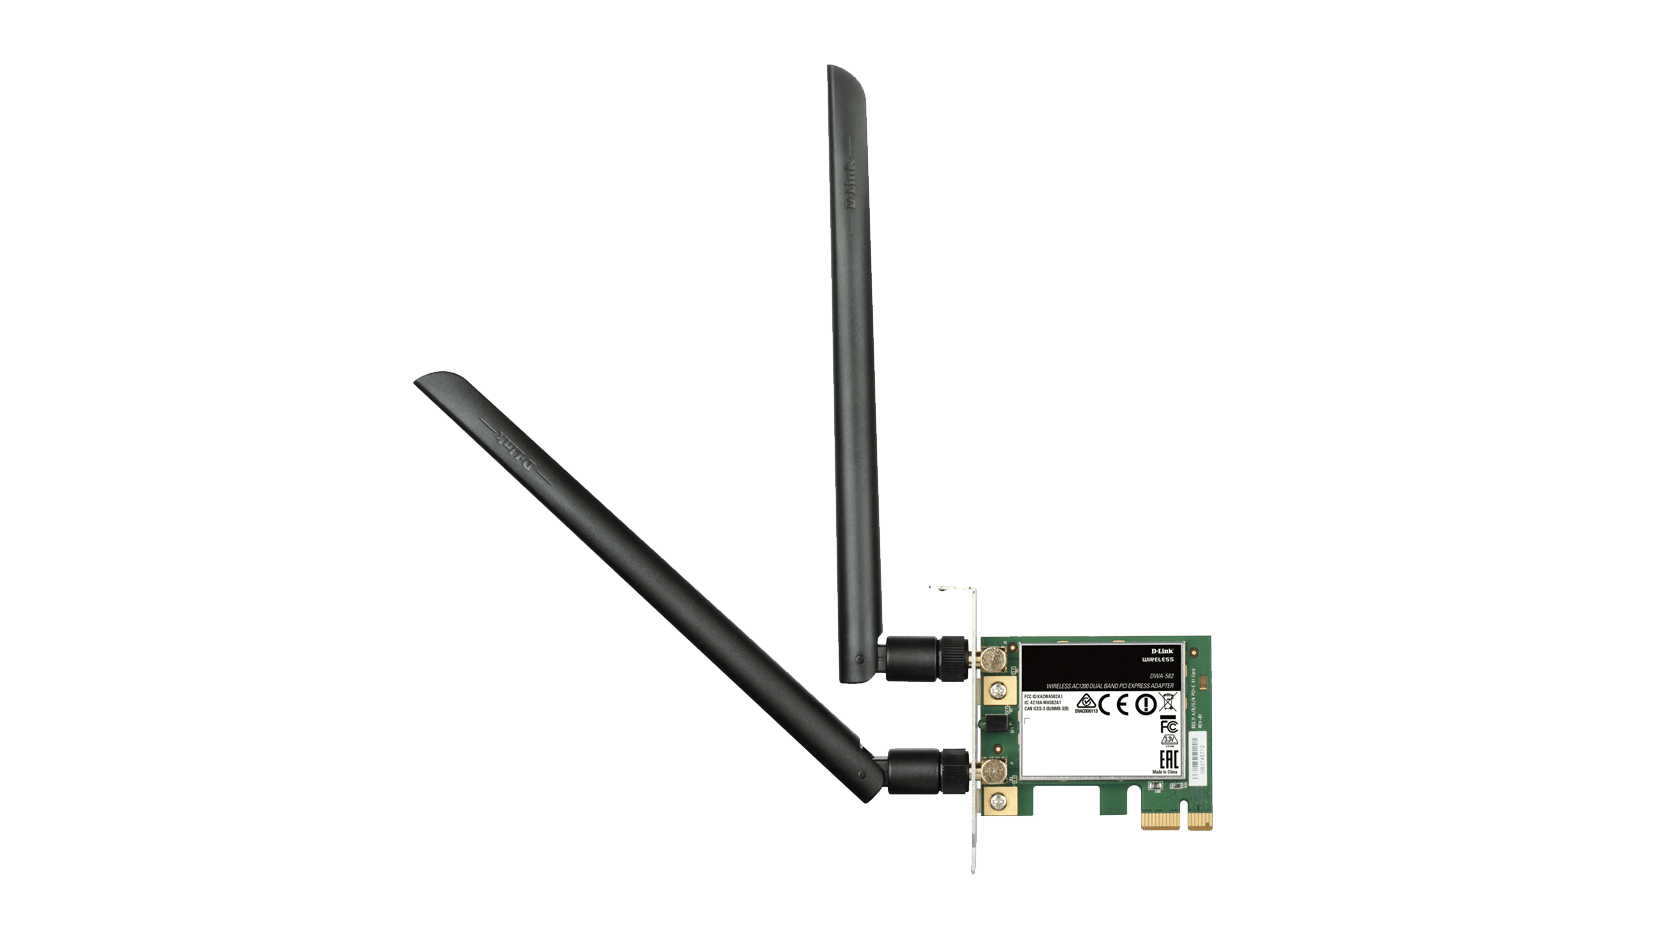 Linksys Wireless G Usb Network Adapter